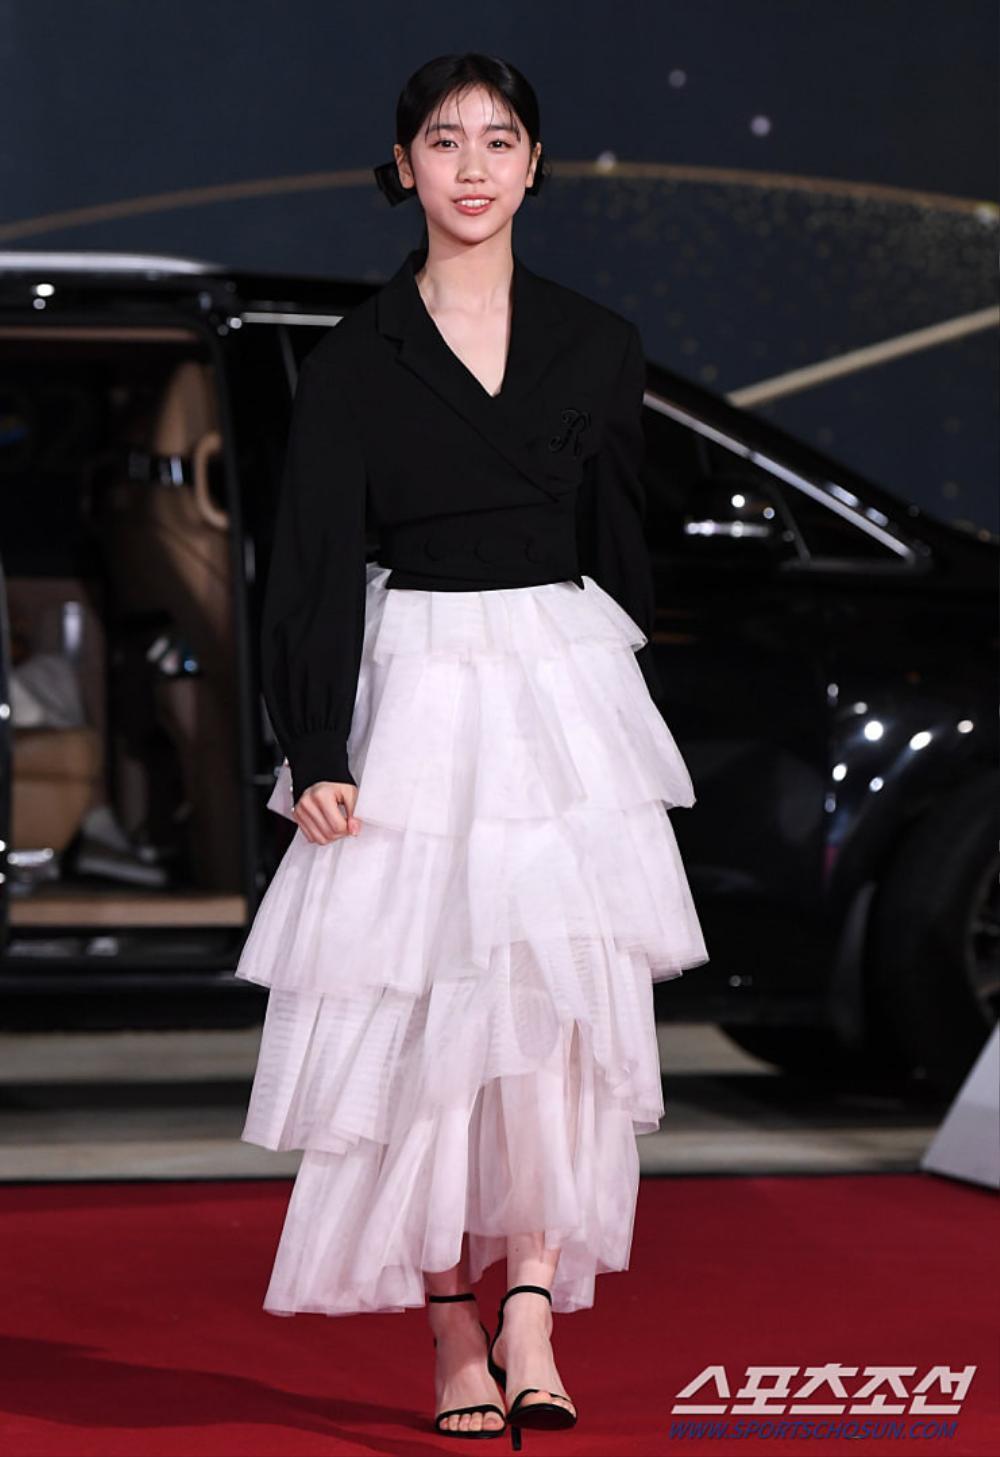 Thảm đỏ 'Rồng xanh 2020': Shin Hye Sun 'cân sắc' Shin Min Ah, Jung Woo Sung - Lee Byung Hun điển trai! Ảnh 6